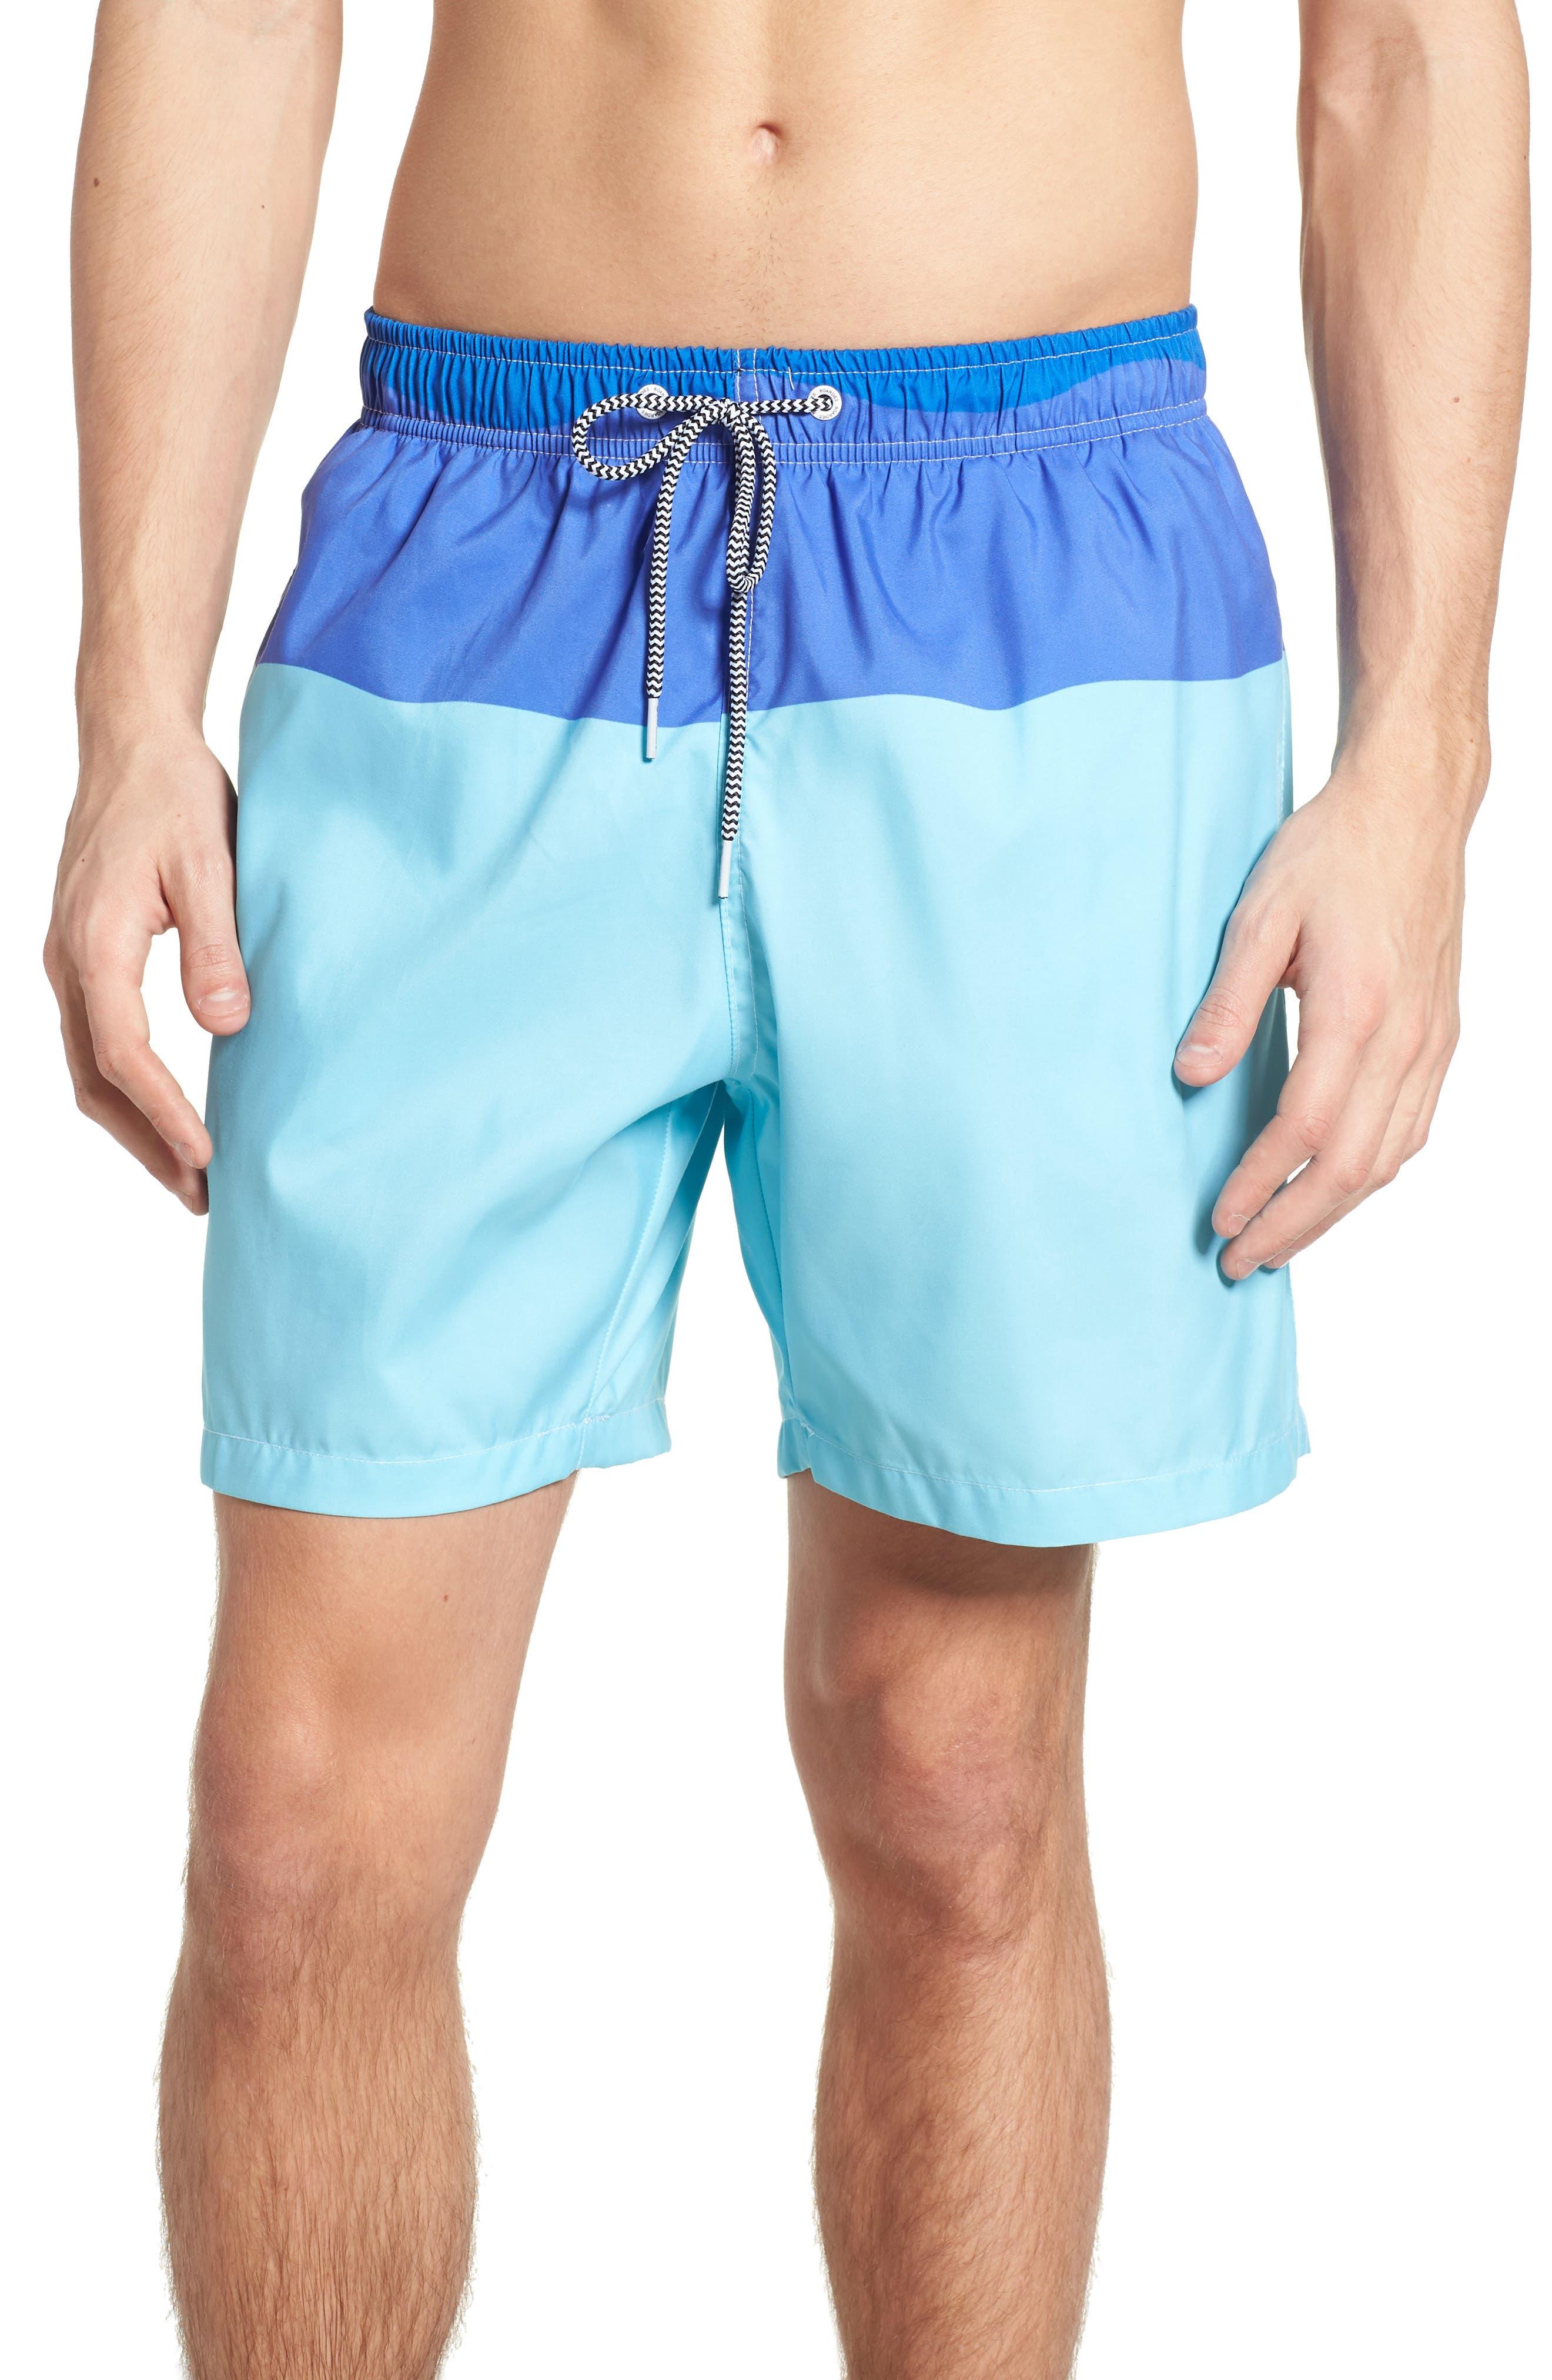 Swim Trunks,                         Main,                         color, Blue